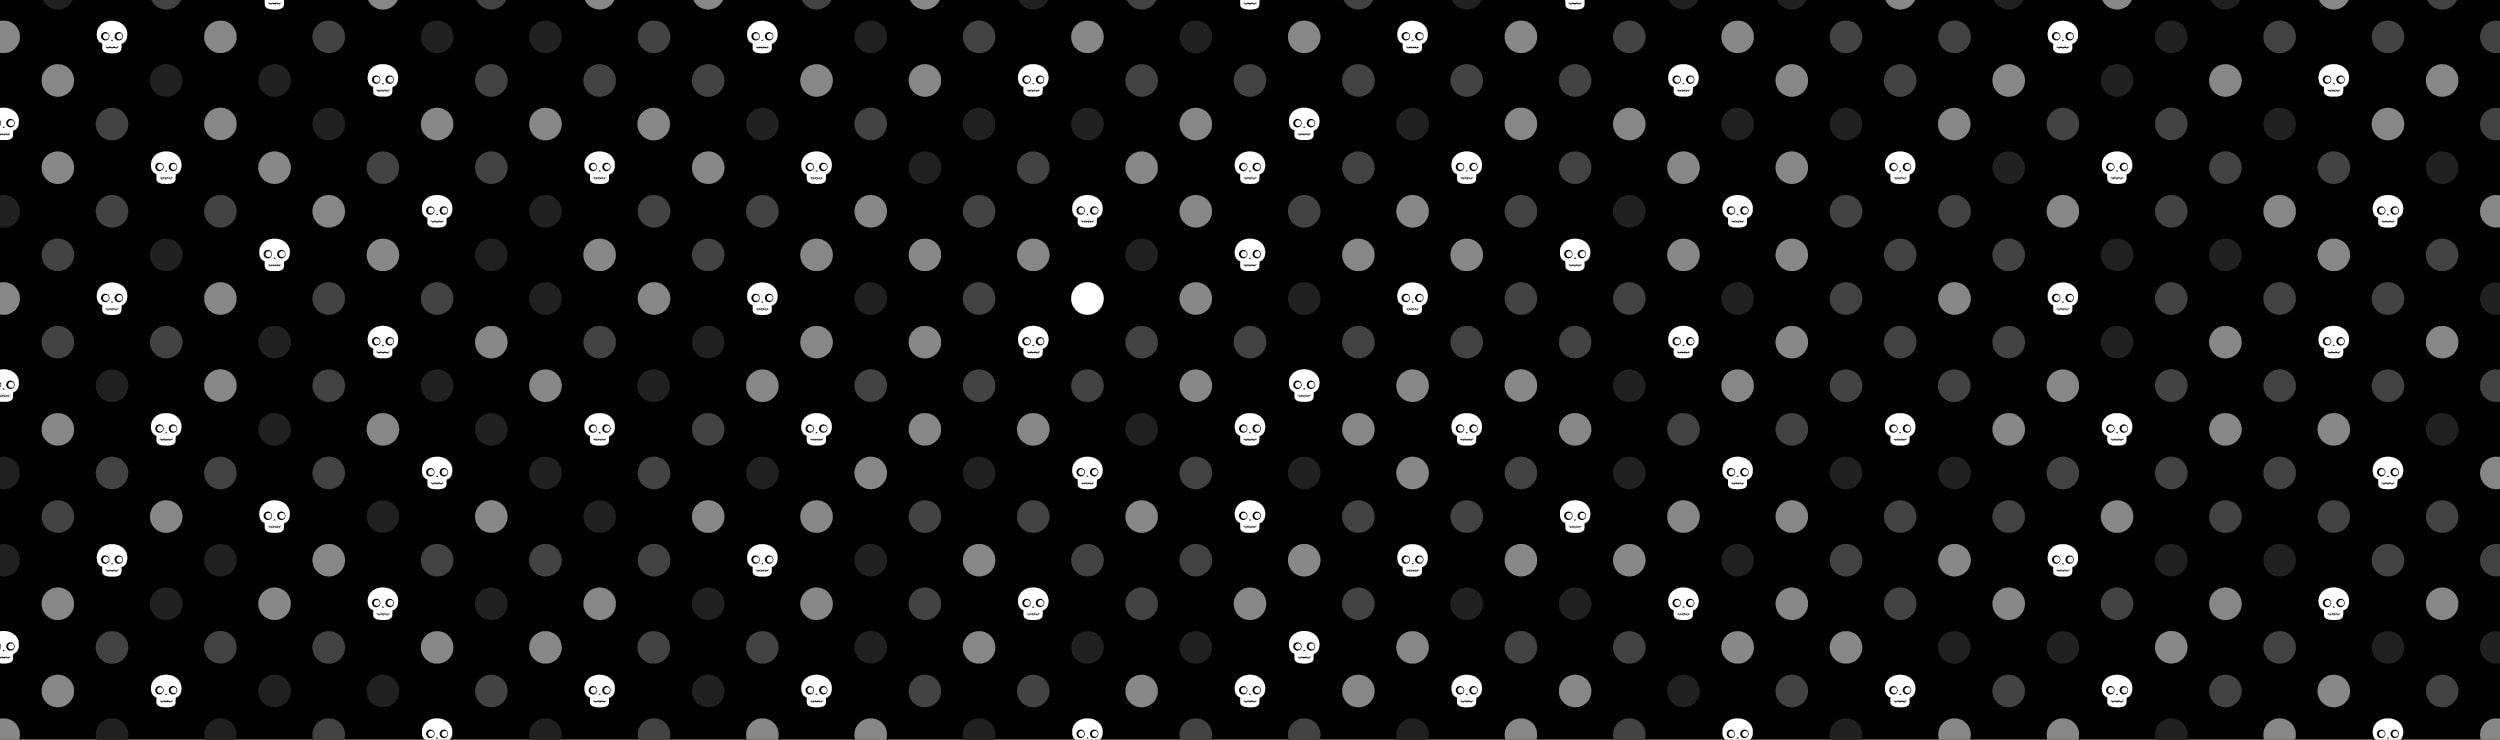 femke_nouters_crankful_pattern_illustration